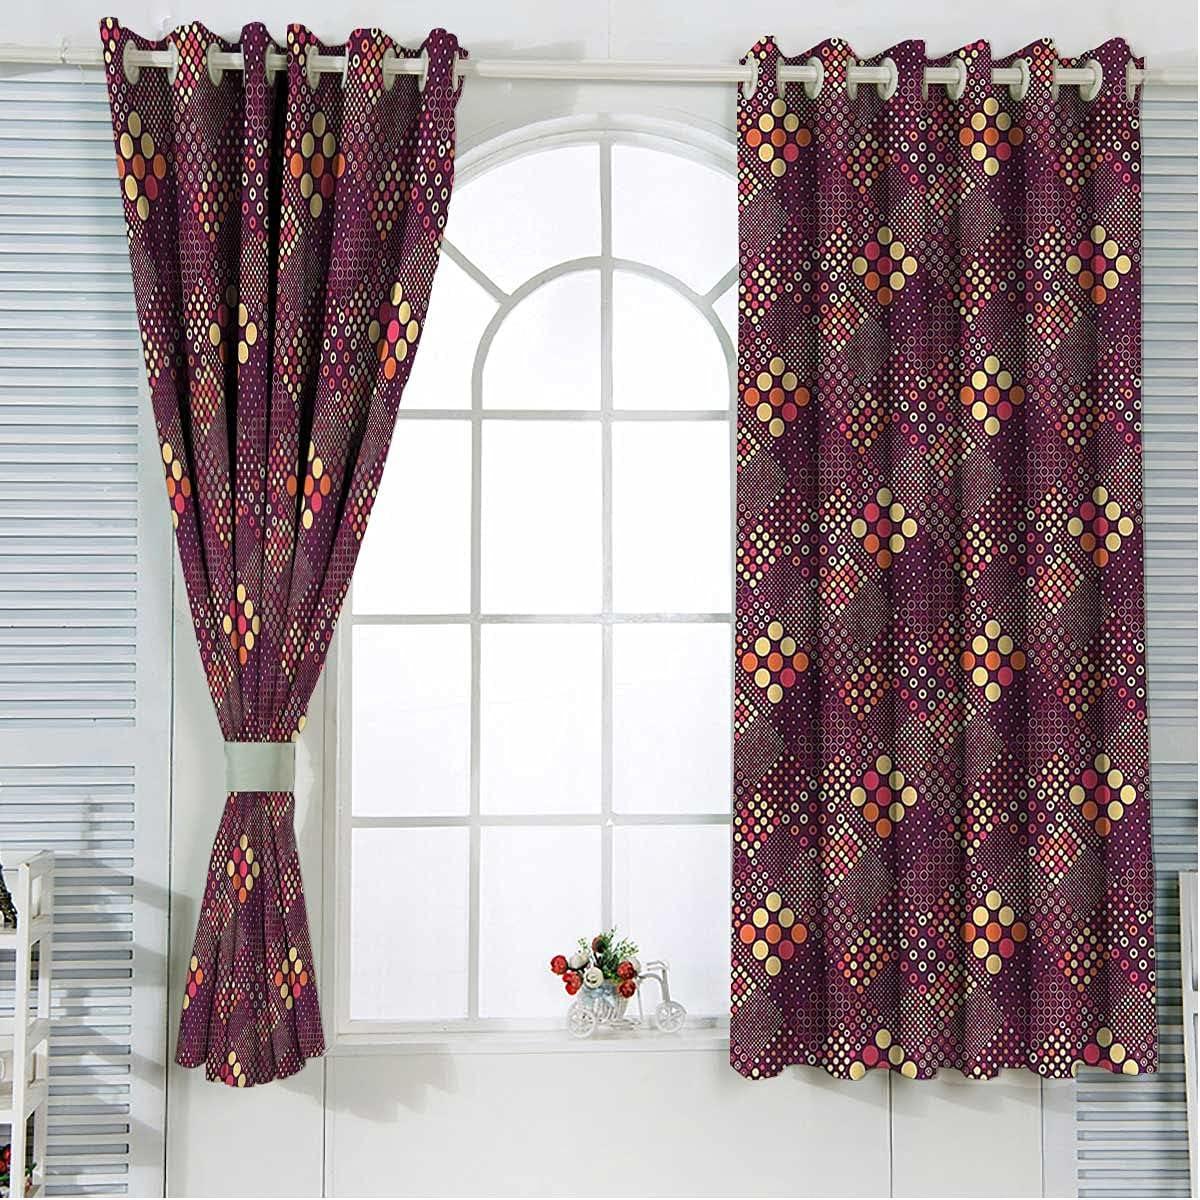 Geometric Extra Wide Curtain Large discharge sale Panels Futuri 63 Length Inch Mosaic trend rank